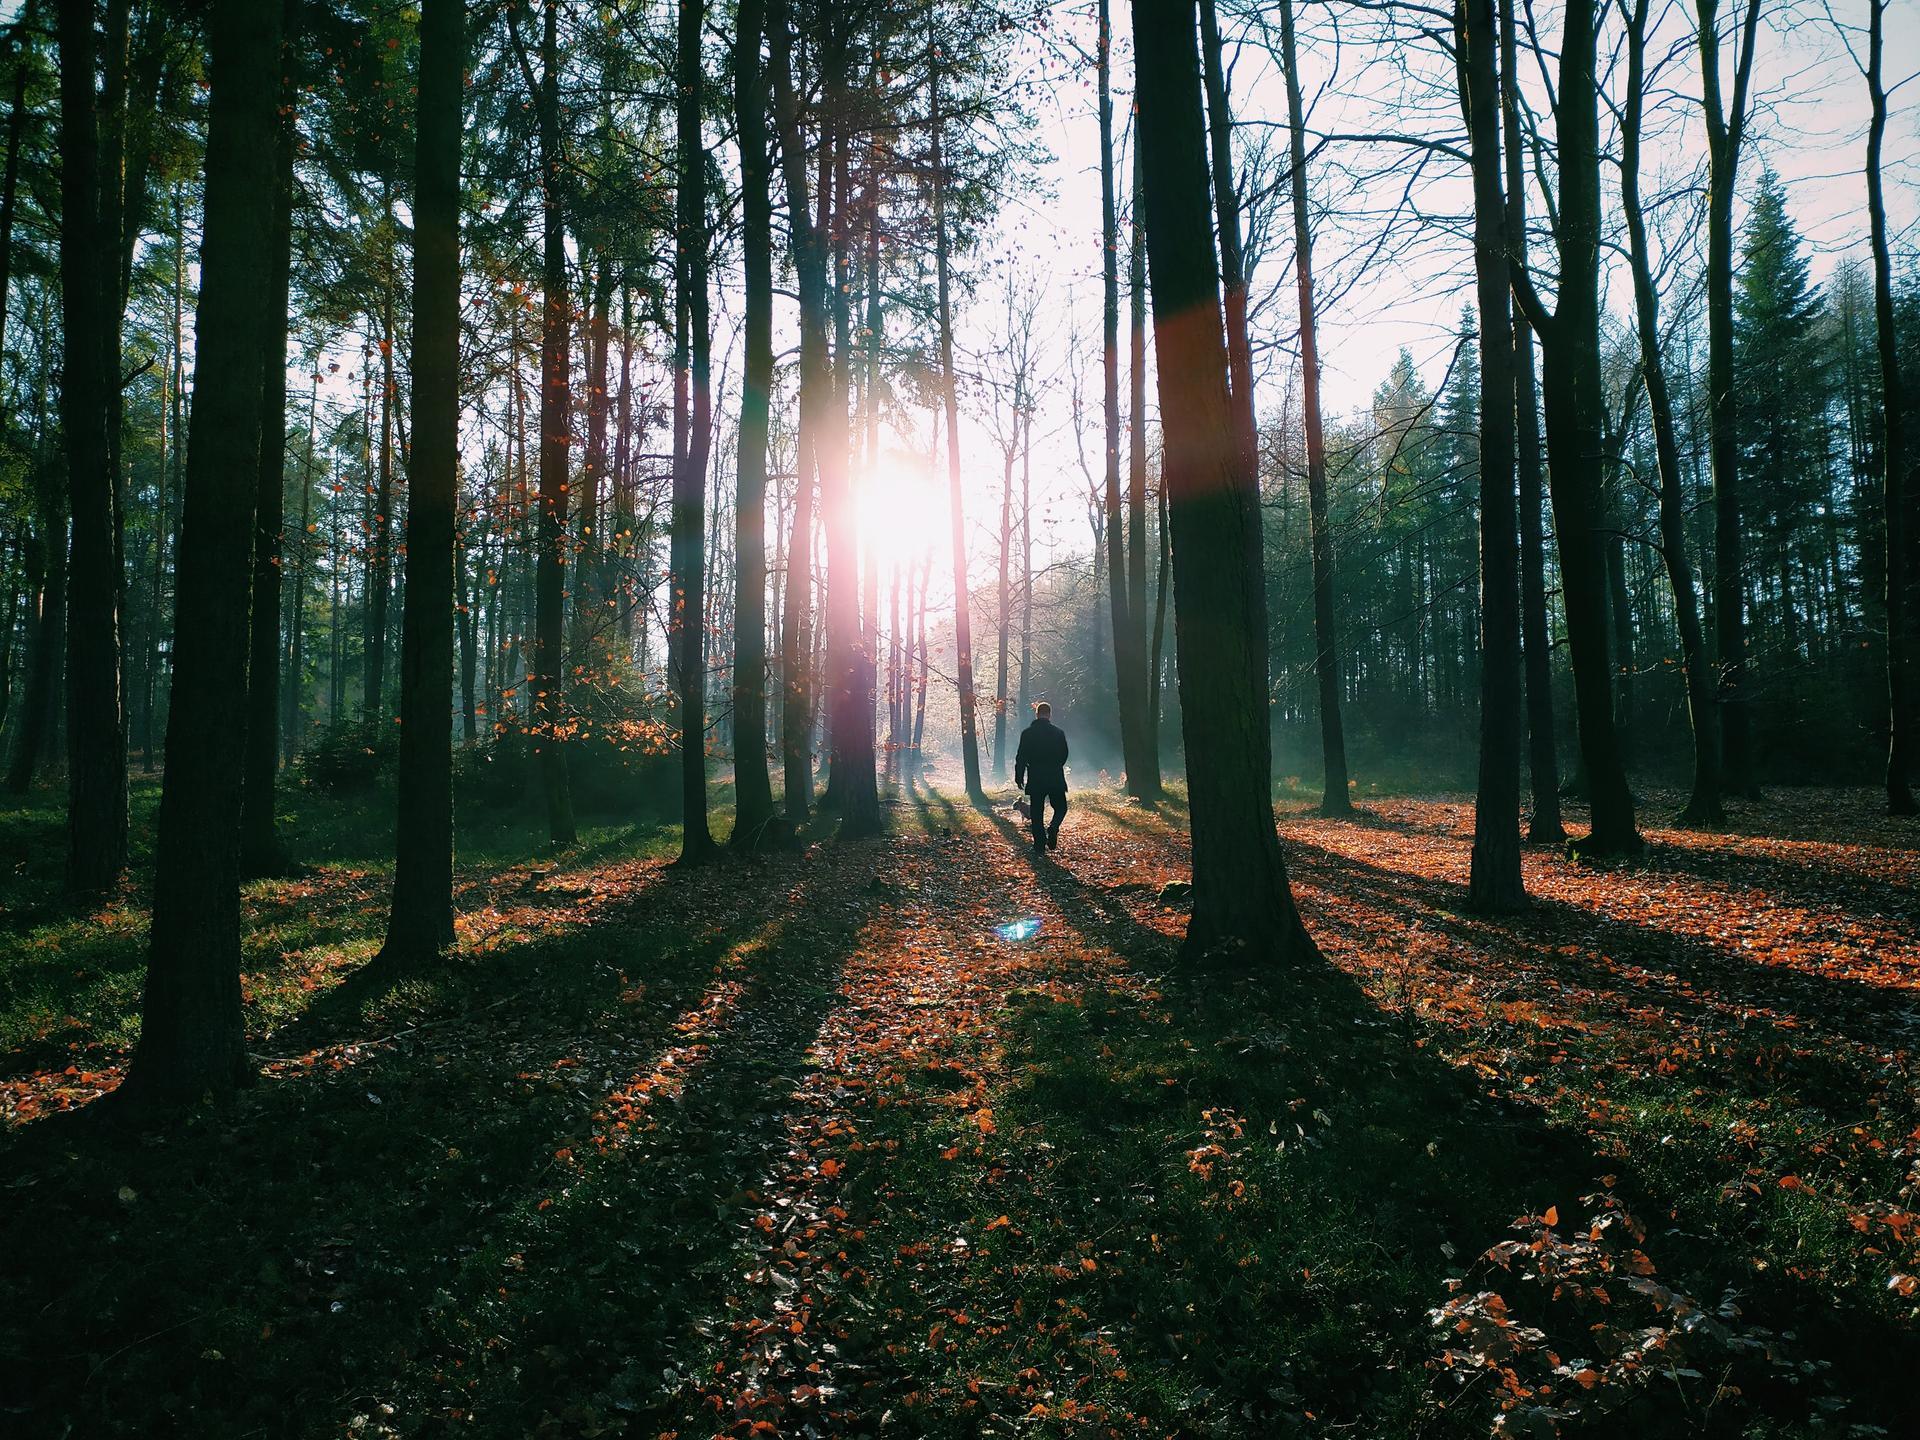 Náš domov ve svahu - U nás v lese